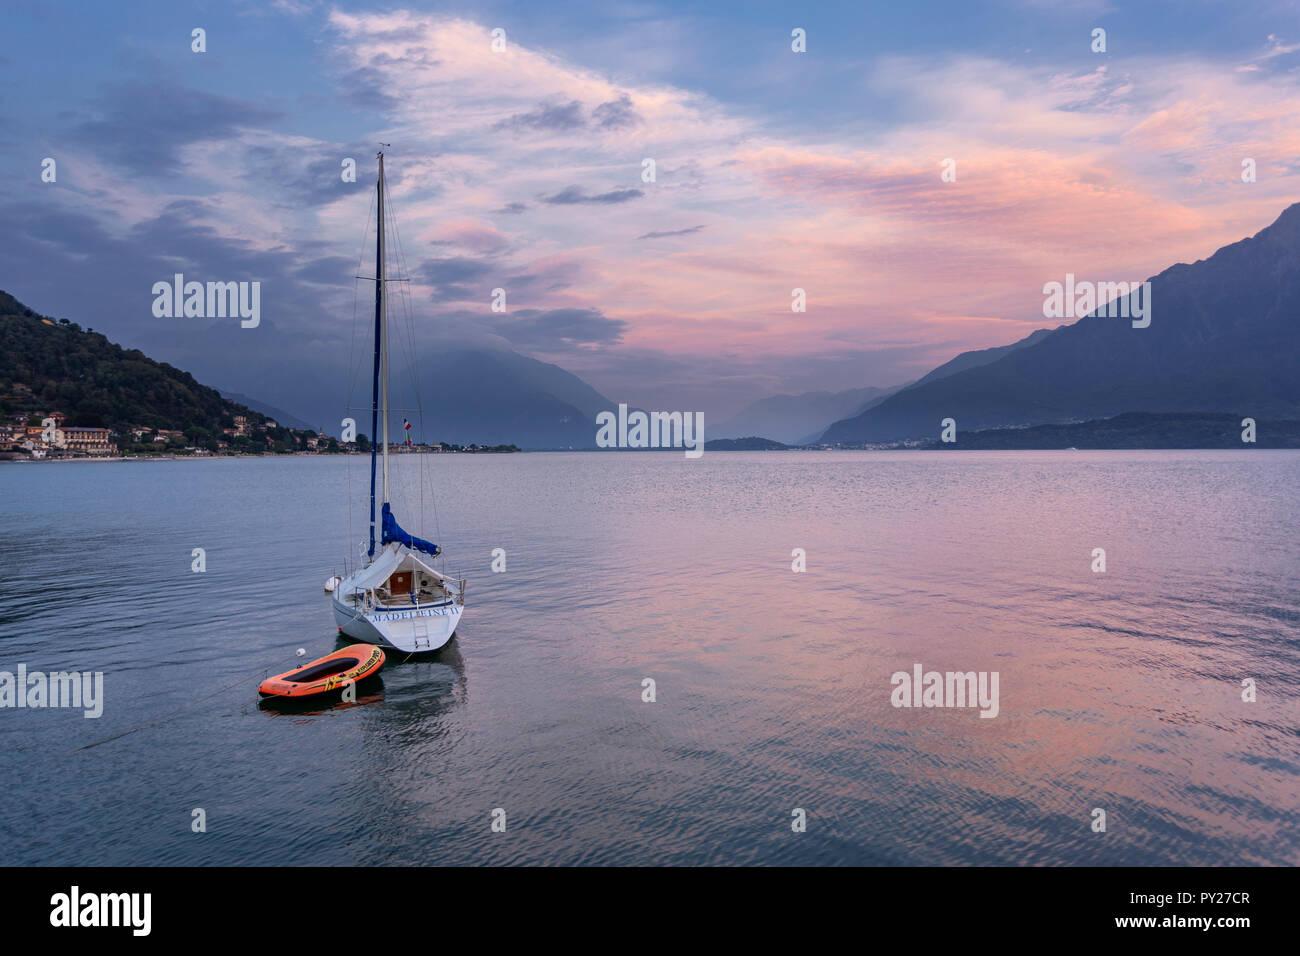 Yacht moored at Gravedona on Lake Como in the Italian mountains at dusk Stock Photo